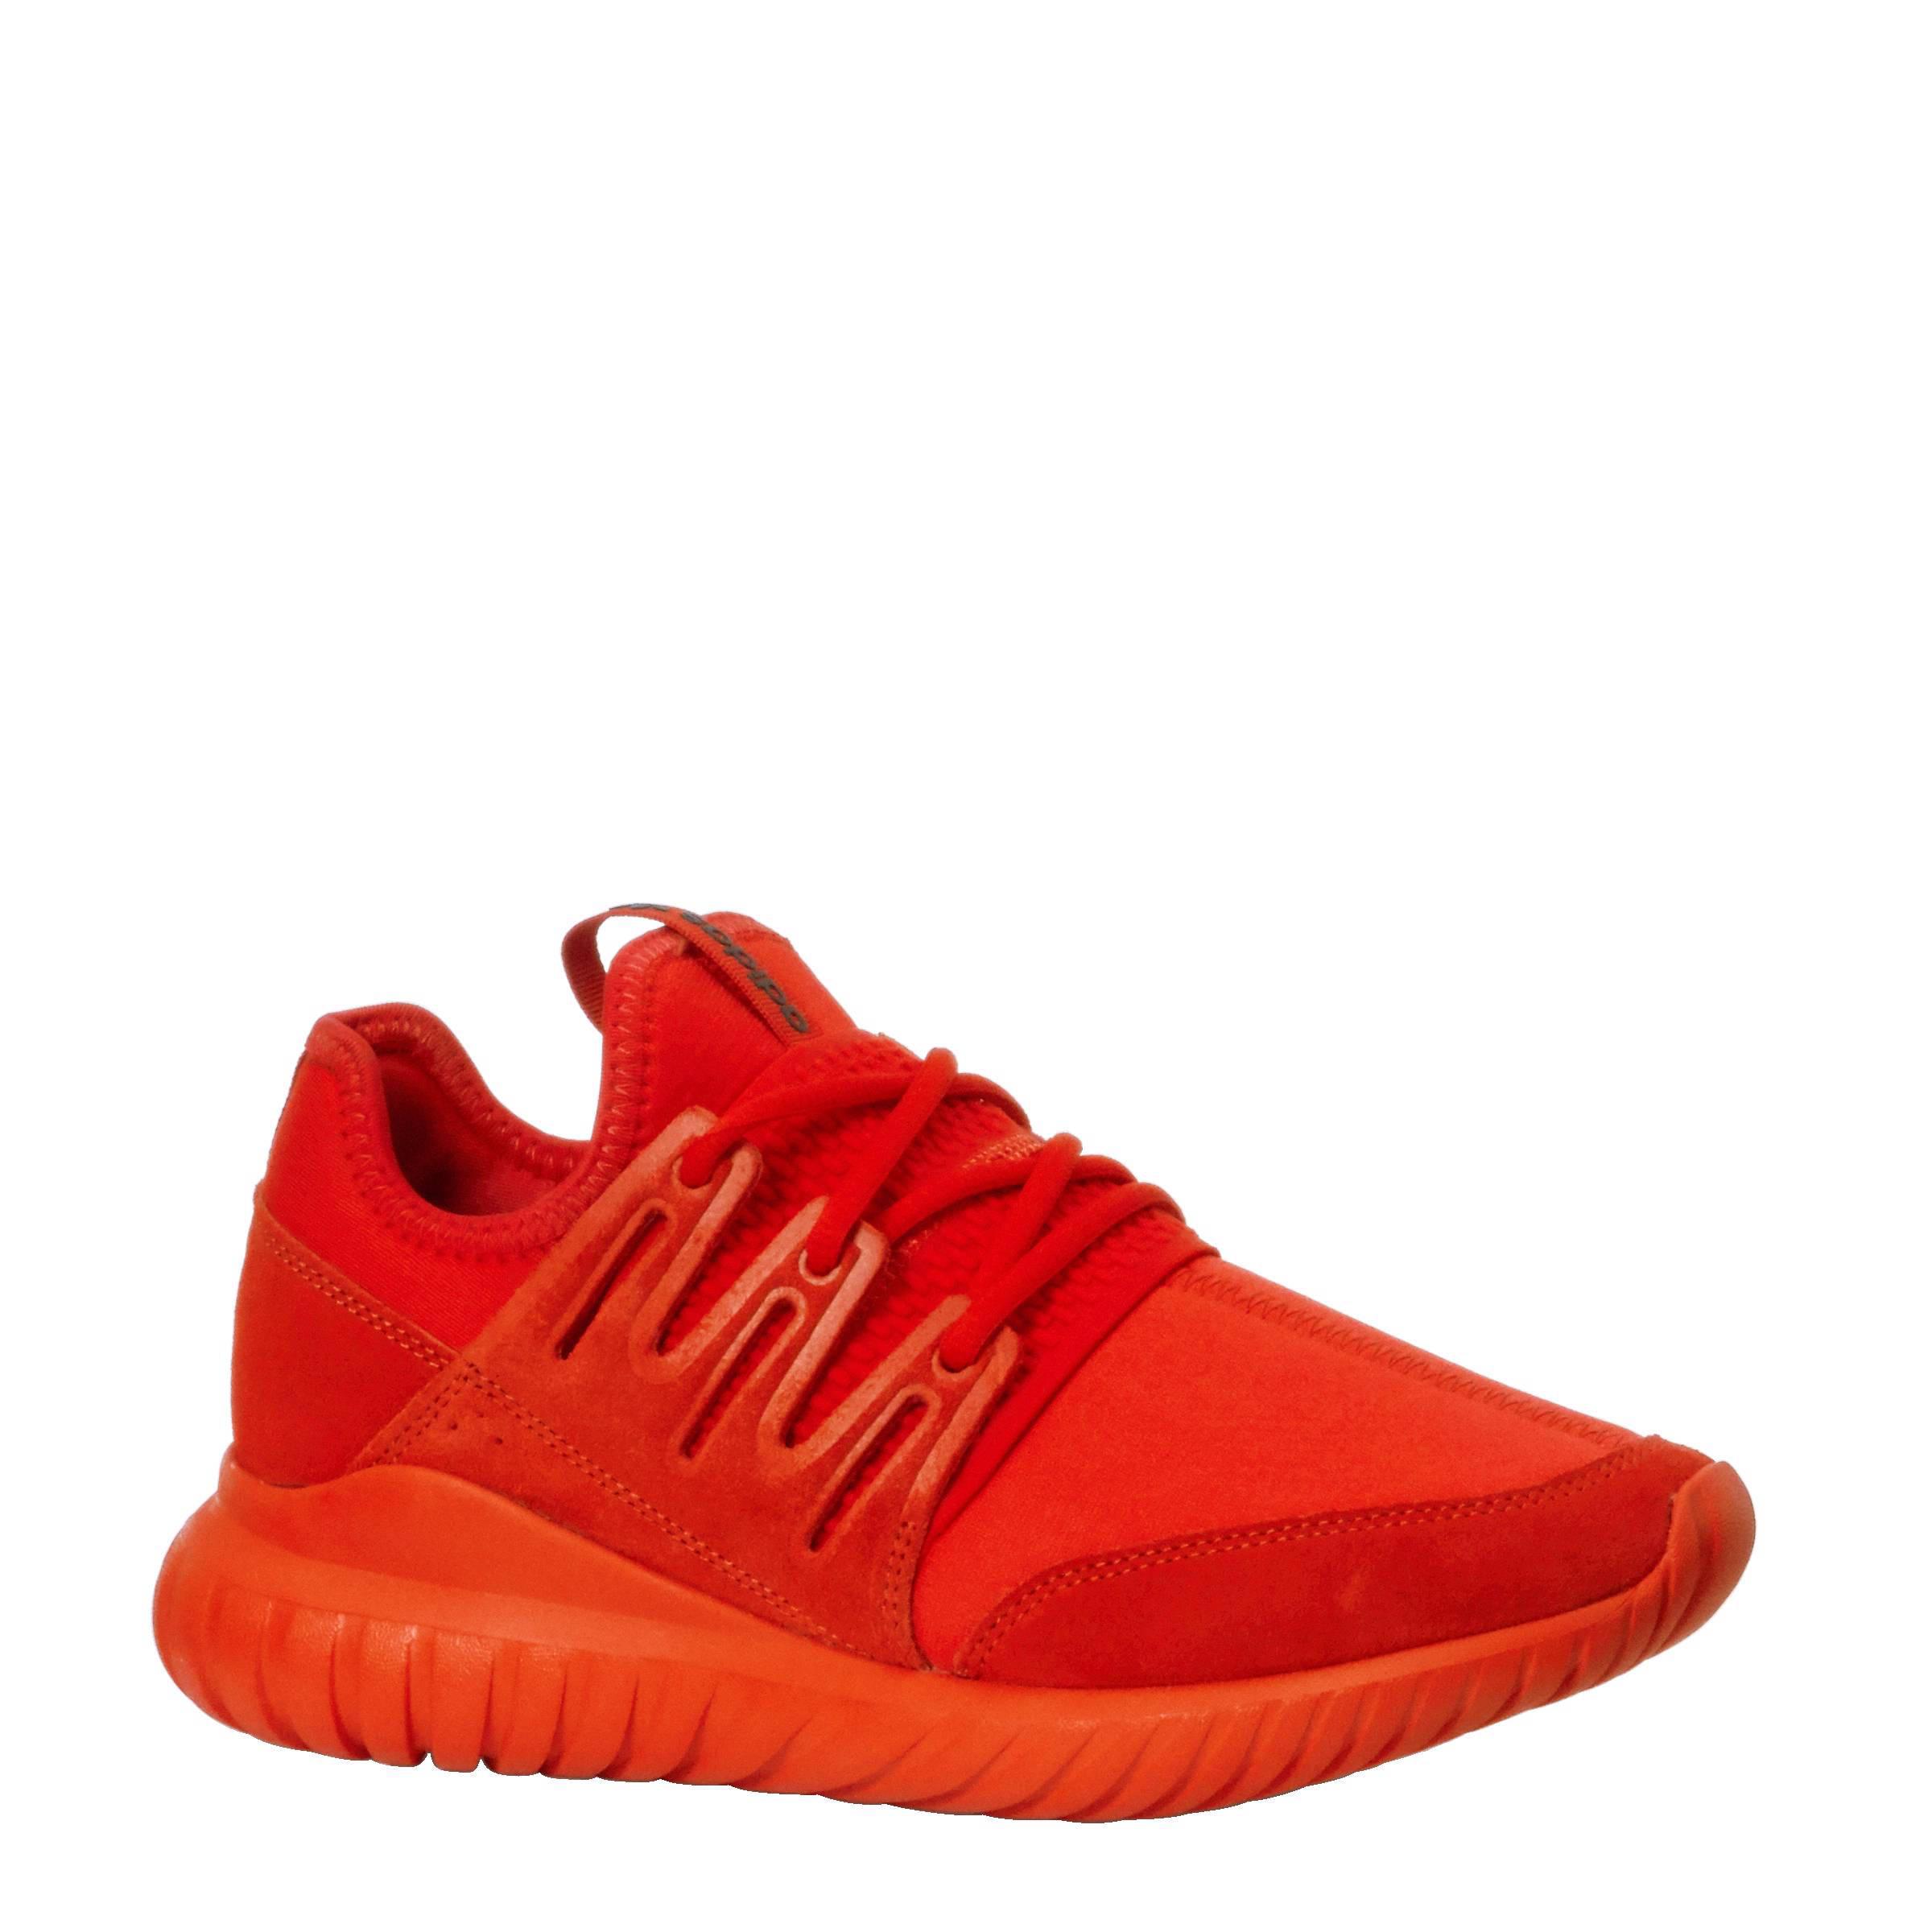 adidas tubular radial rood